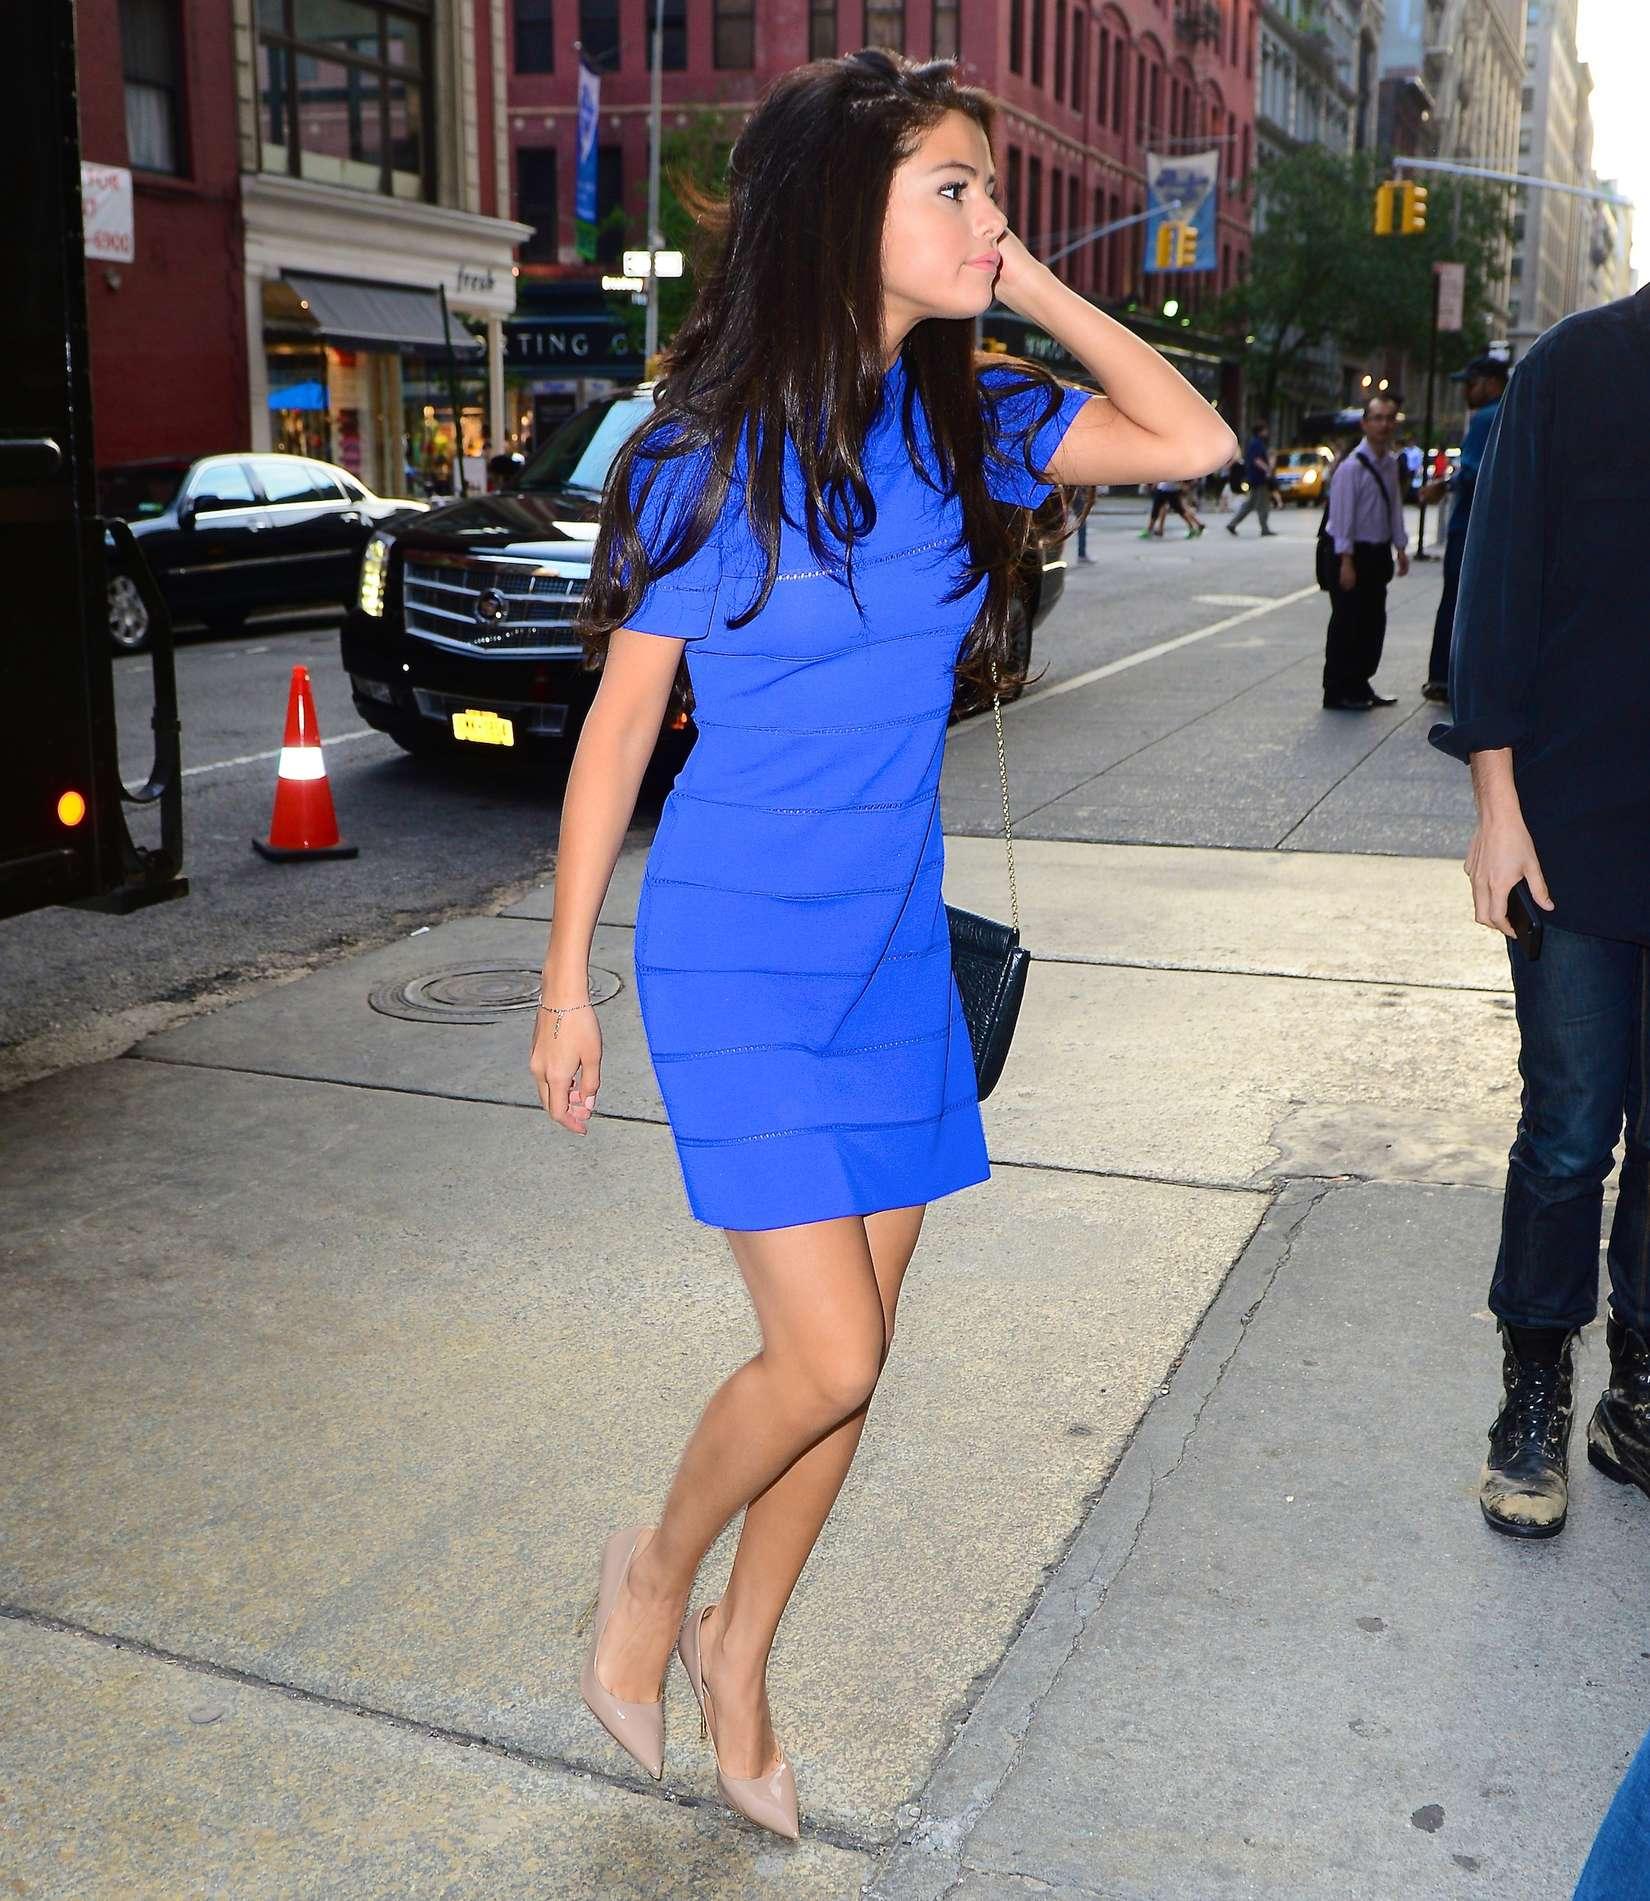 selena gomez hot in blue dress -02 - gotceleb